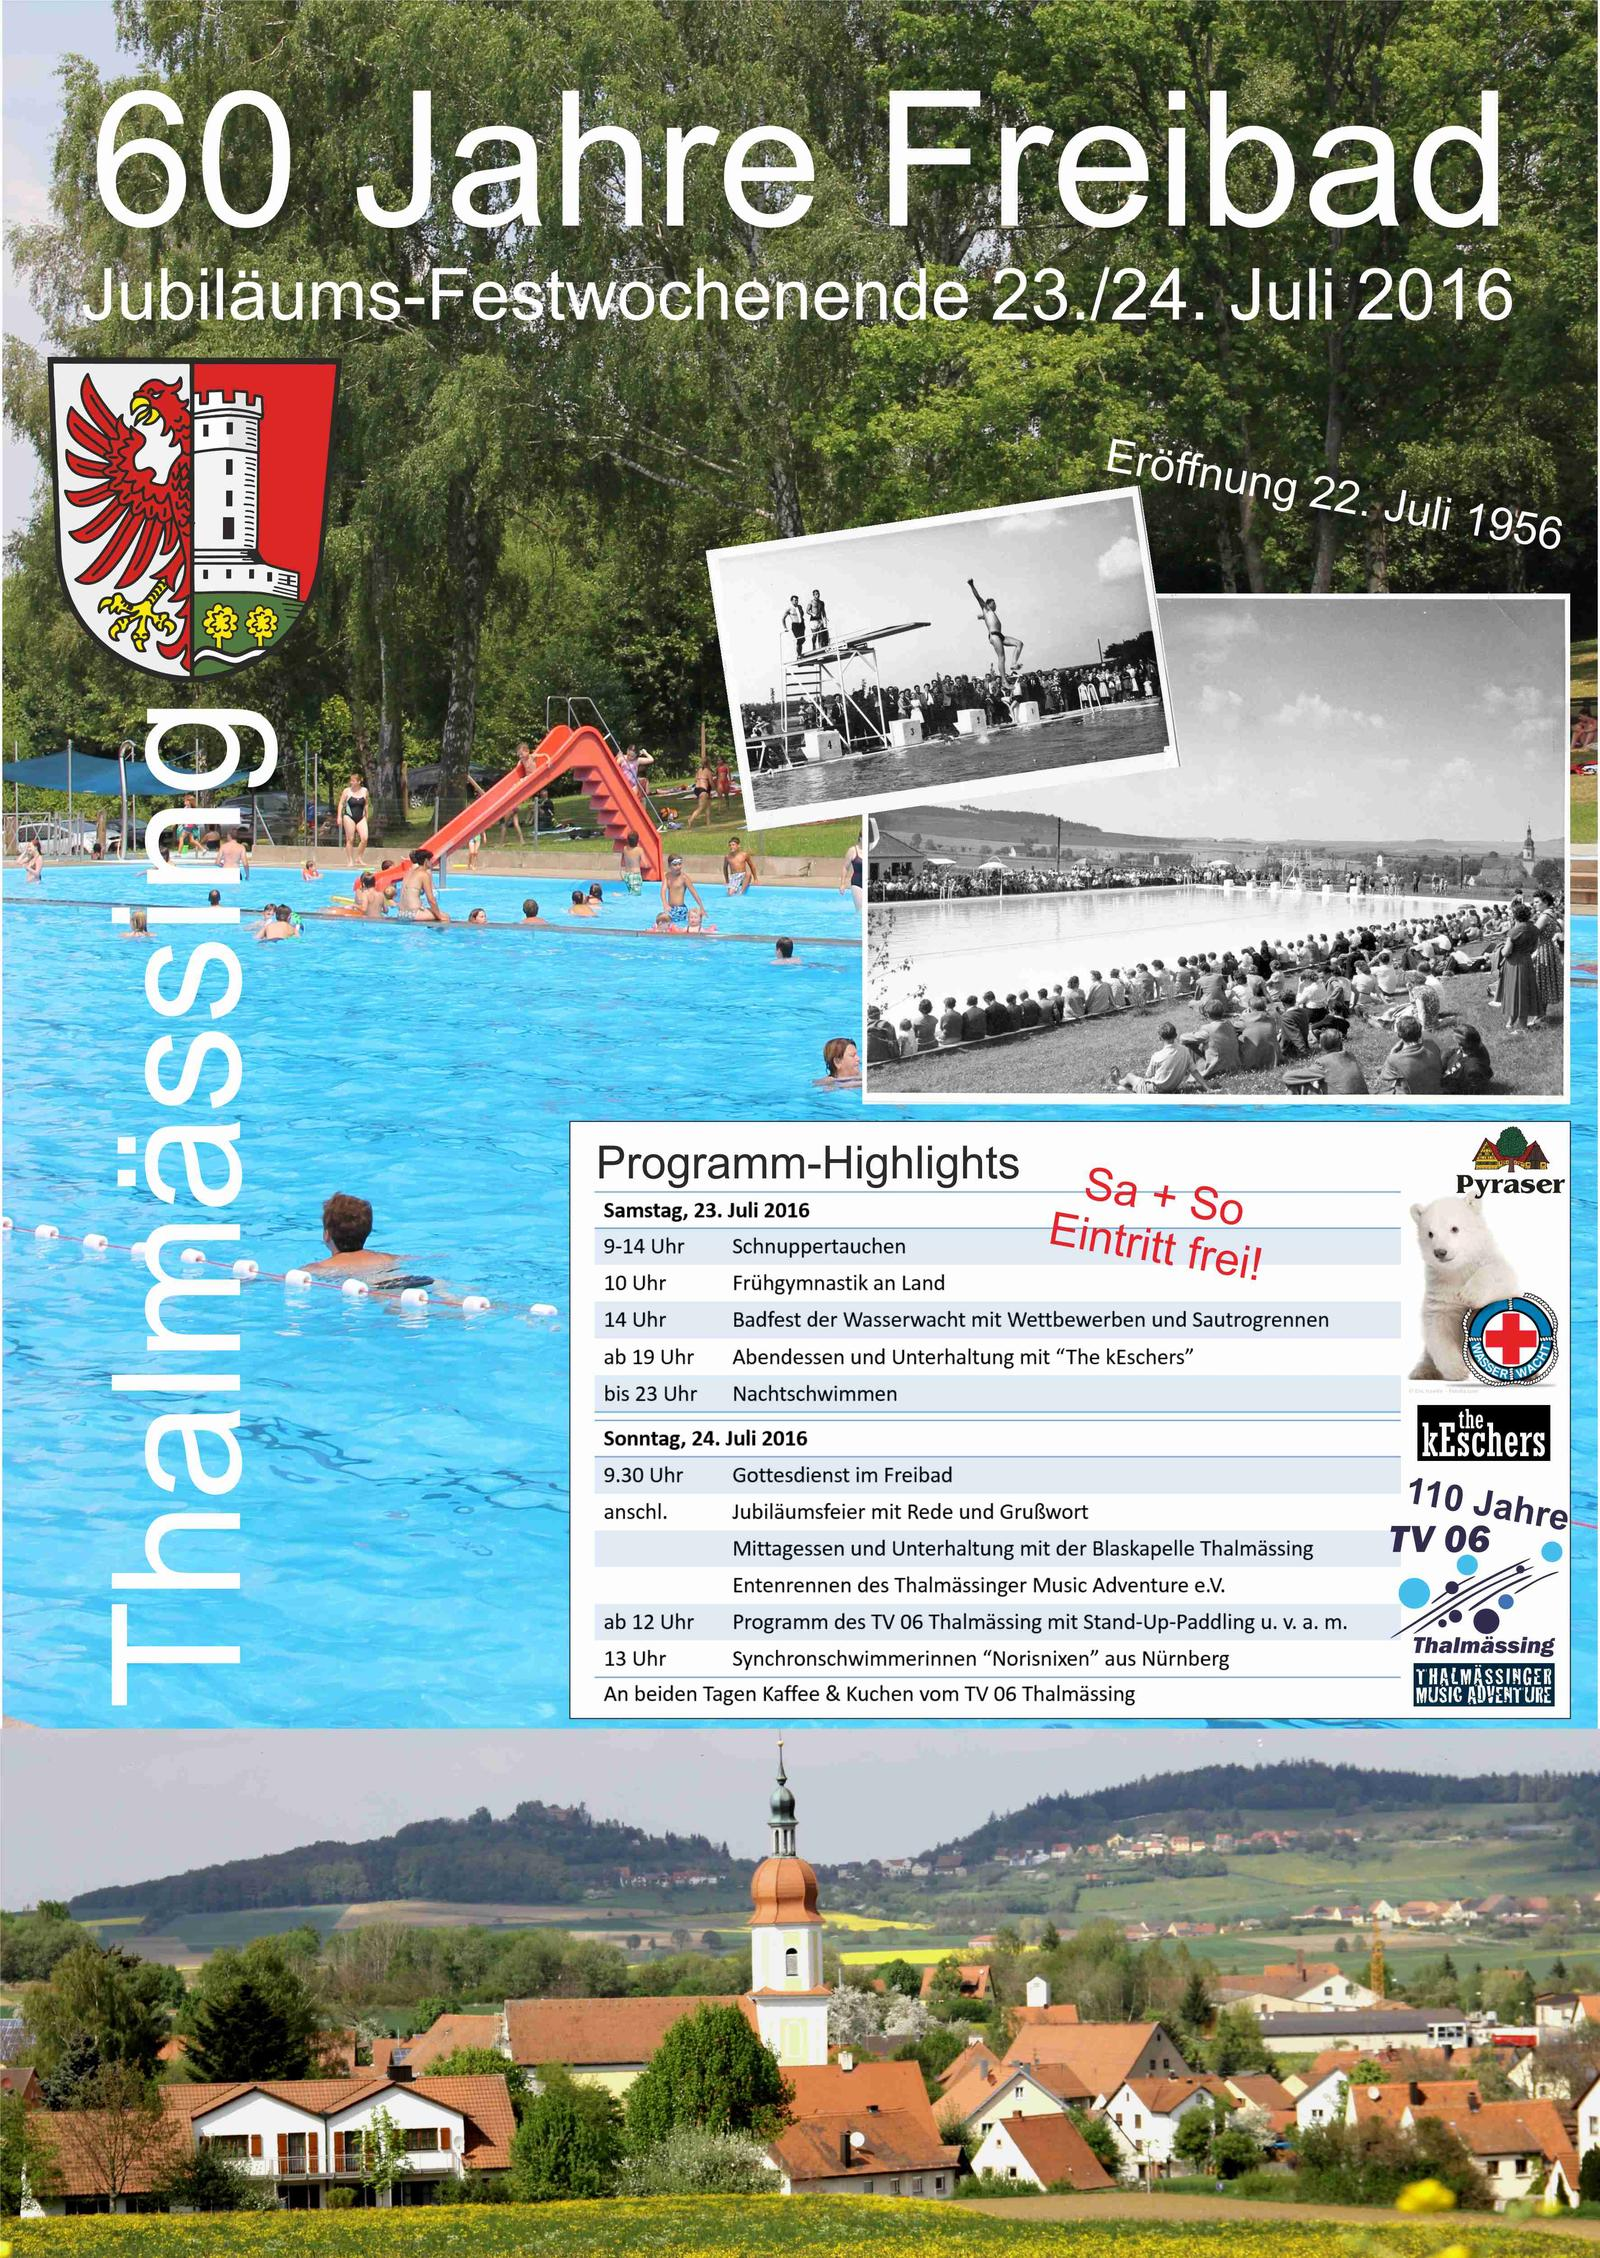 Freibadjubilaeum2016_Plakat20160611_mitEntenrennen